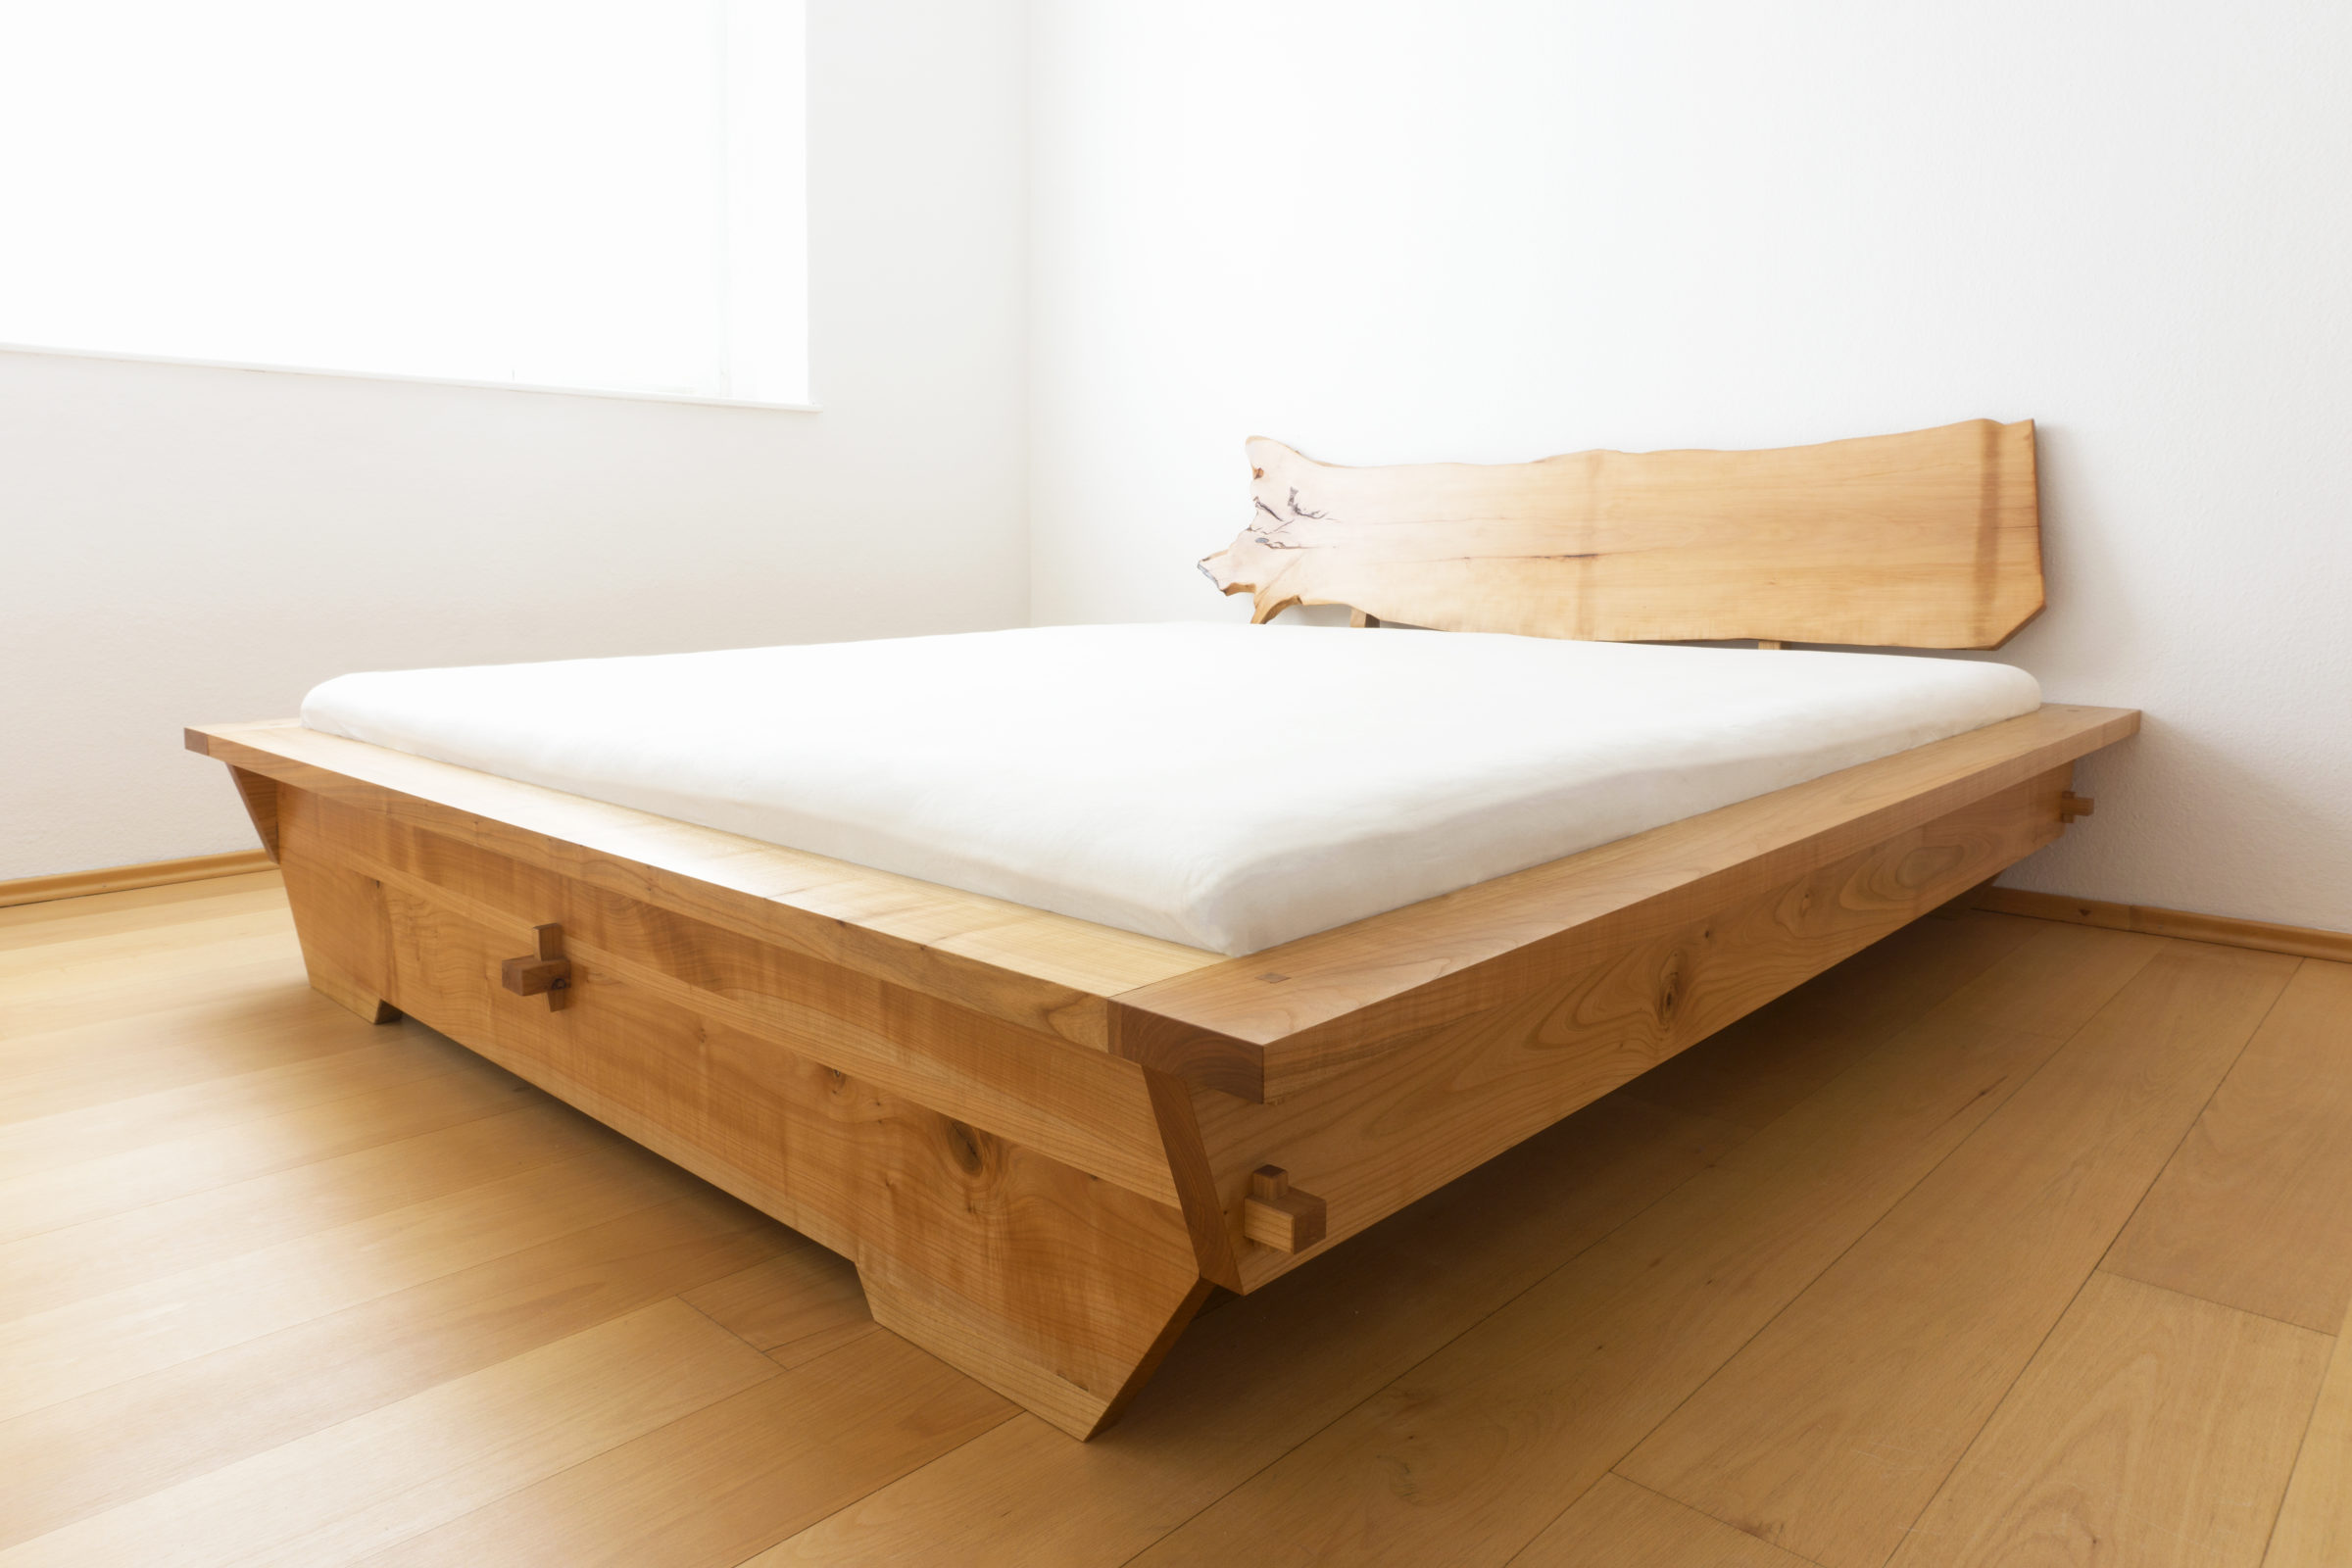 Bett, Massivholzmöbel handgemacht, Hochwertige Möbel aus Massivholz, Holzoberflächen handgehobelt, Einzelmöbelstücke, The Trees of Life